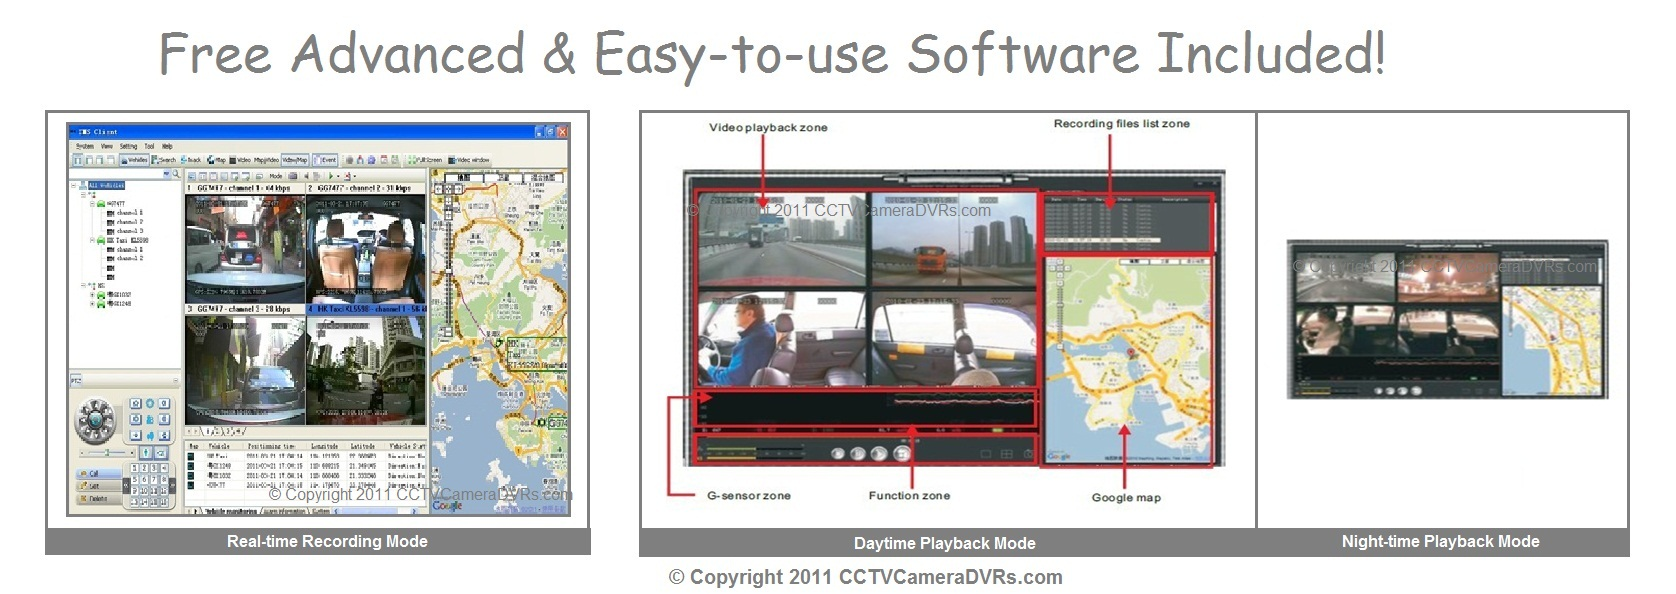 Trafficmasterplan Com H 264 Dvr Player Software border=